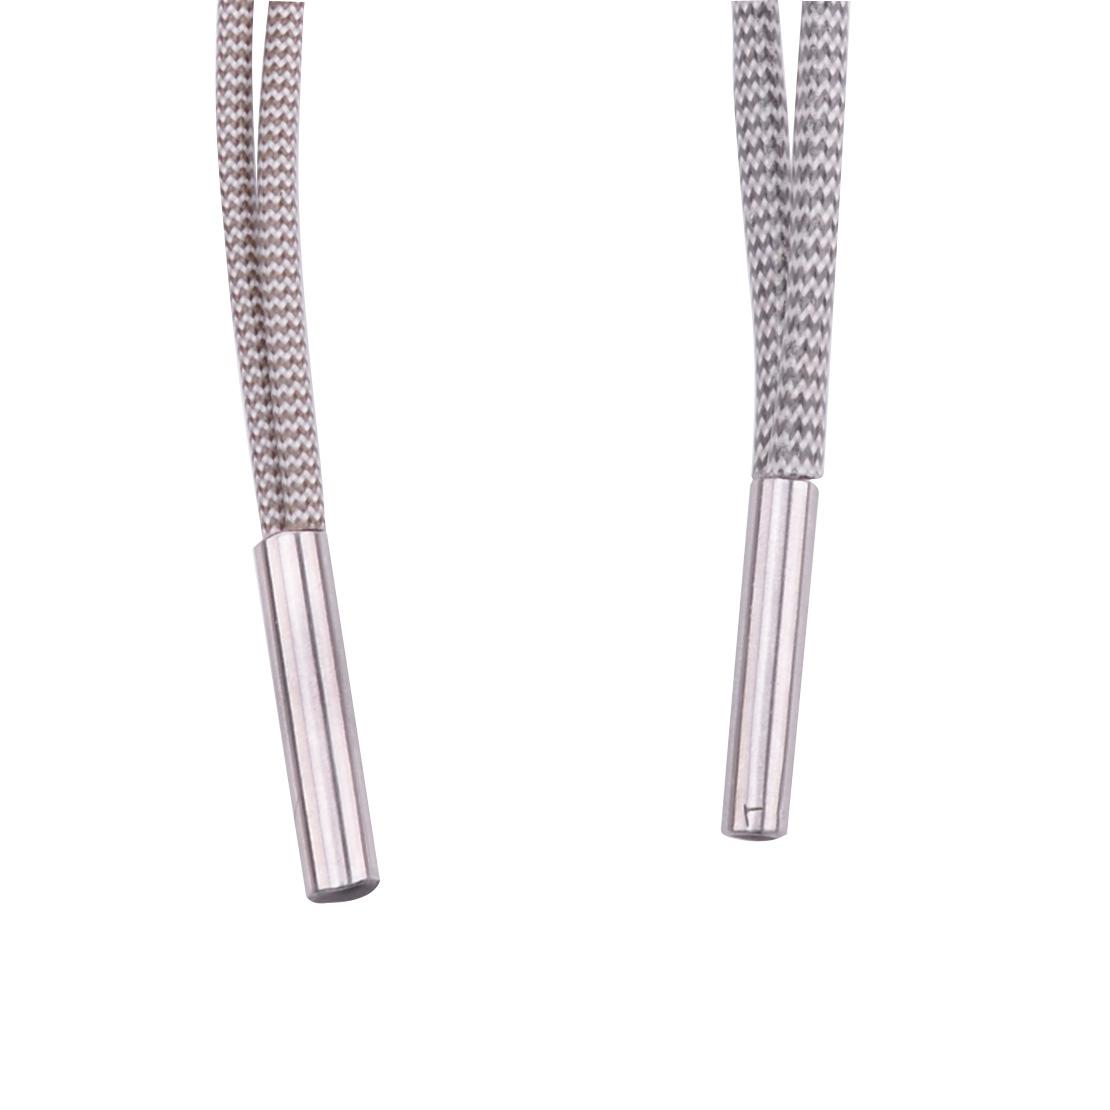 2pcs Ac 110v 100w Power Mould Cartridge Heater Tubing